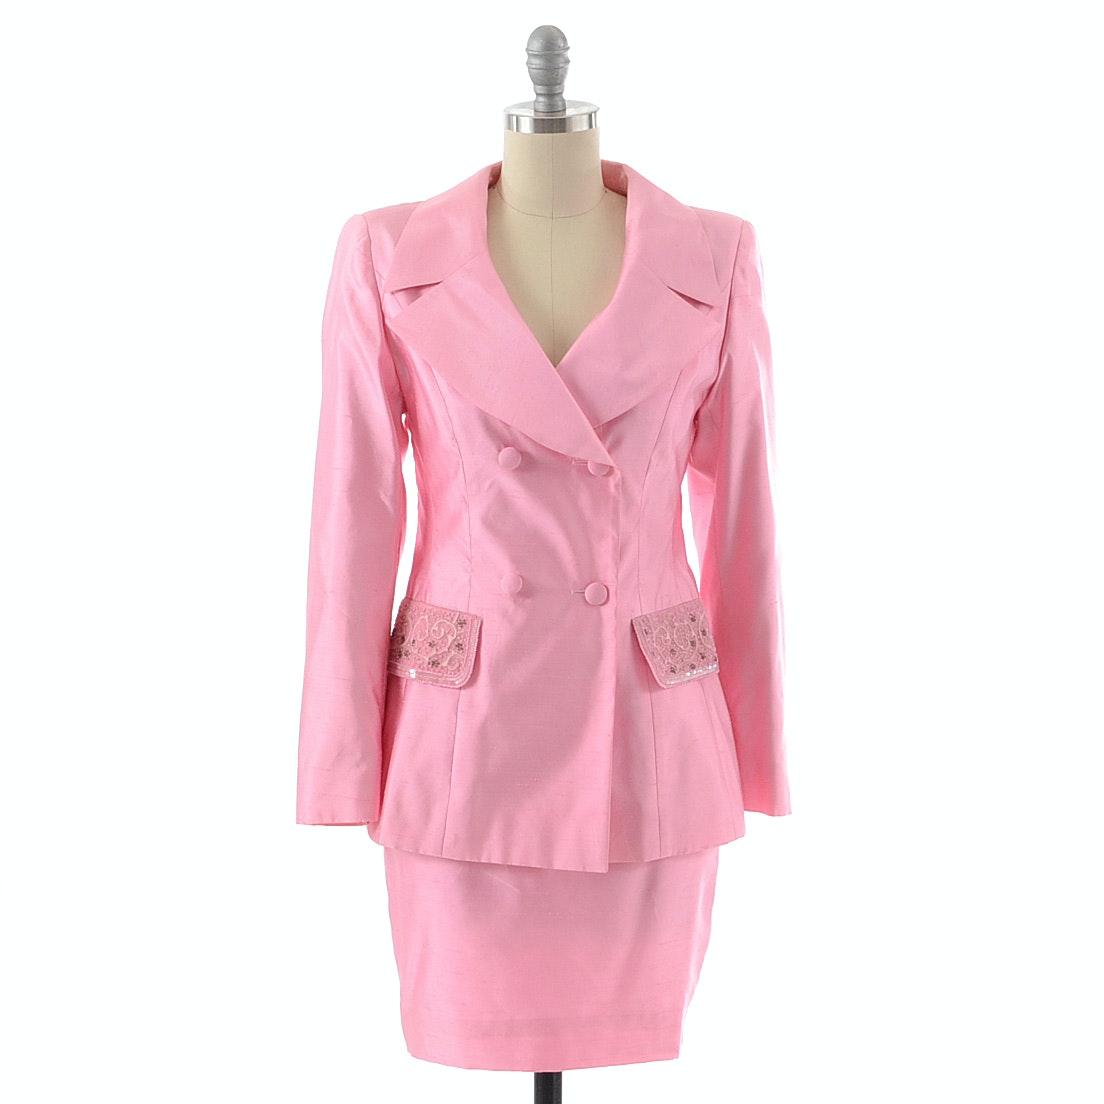 Escada Couture Pink Silk Dupioni Suit